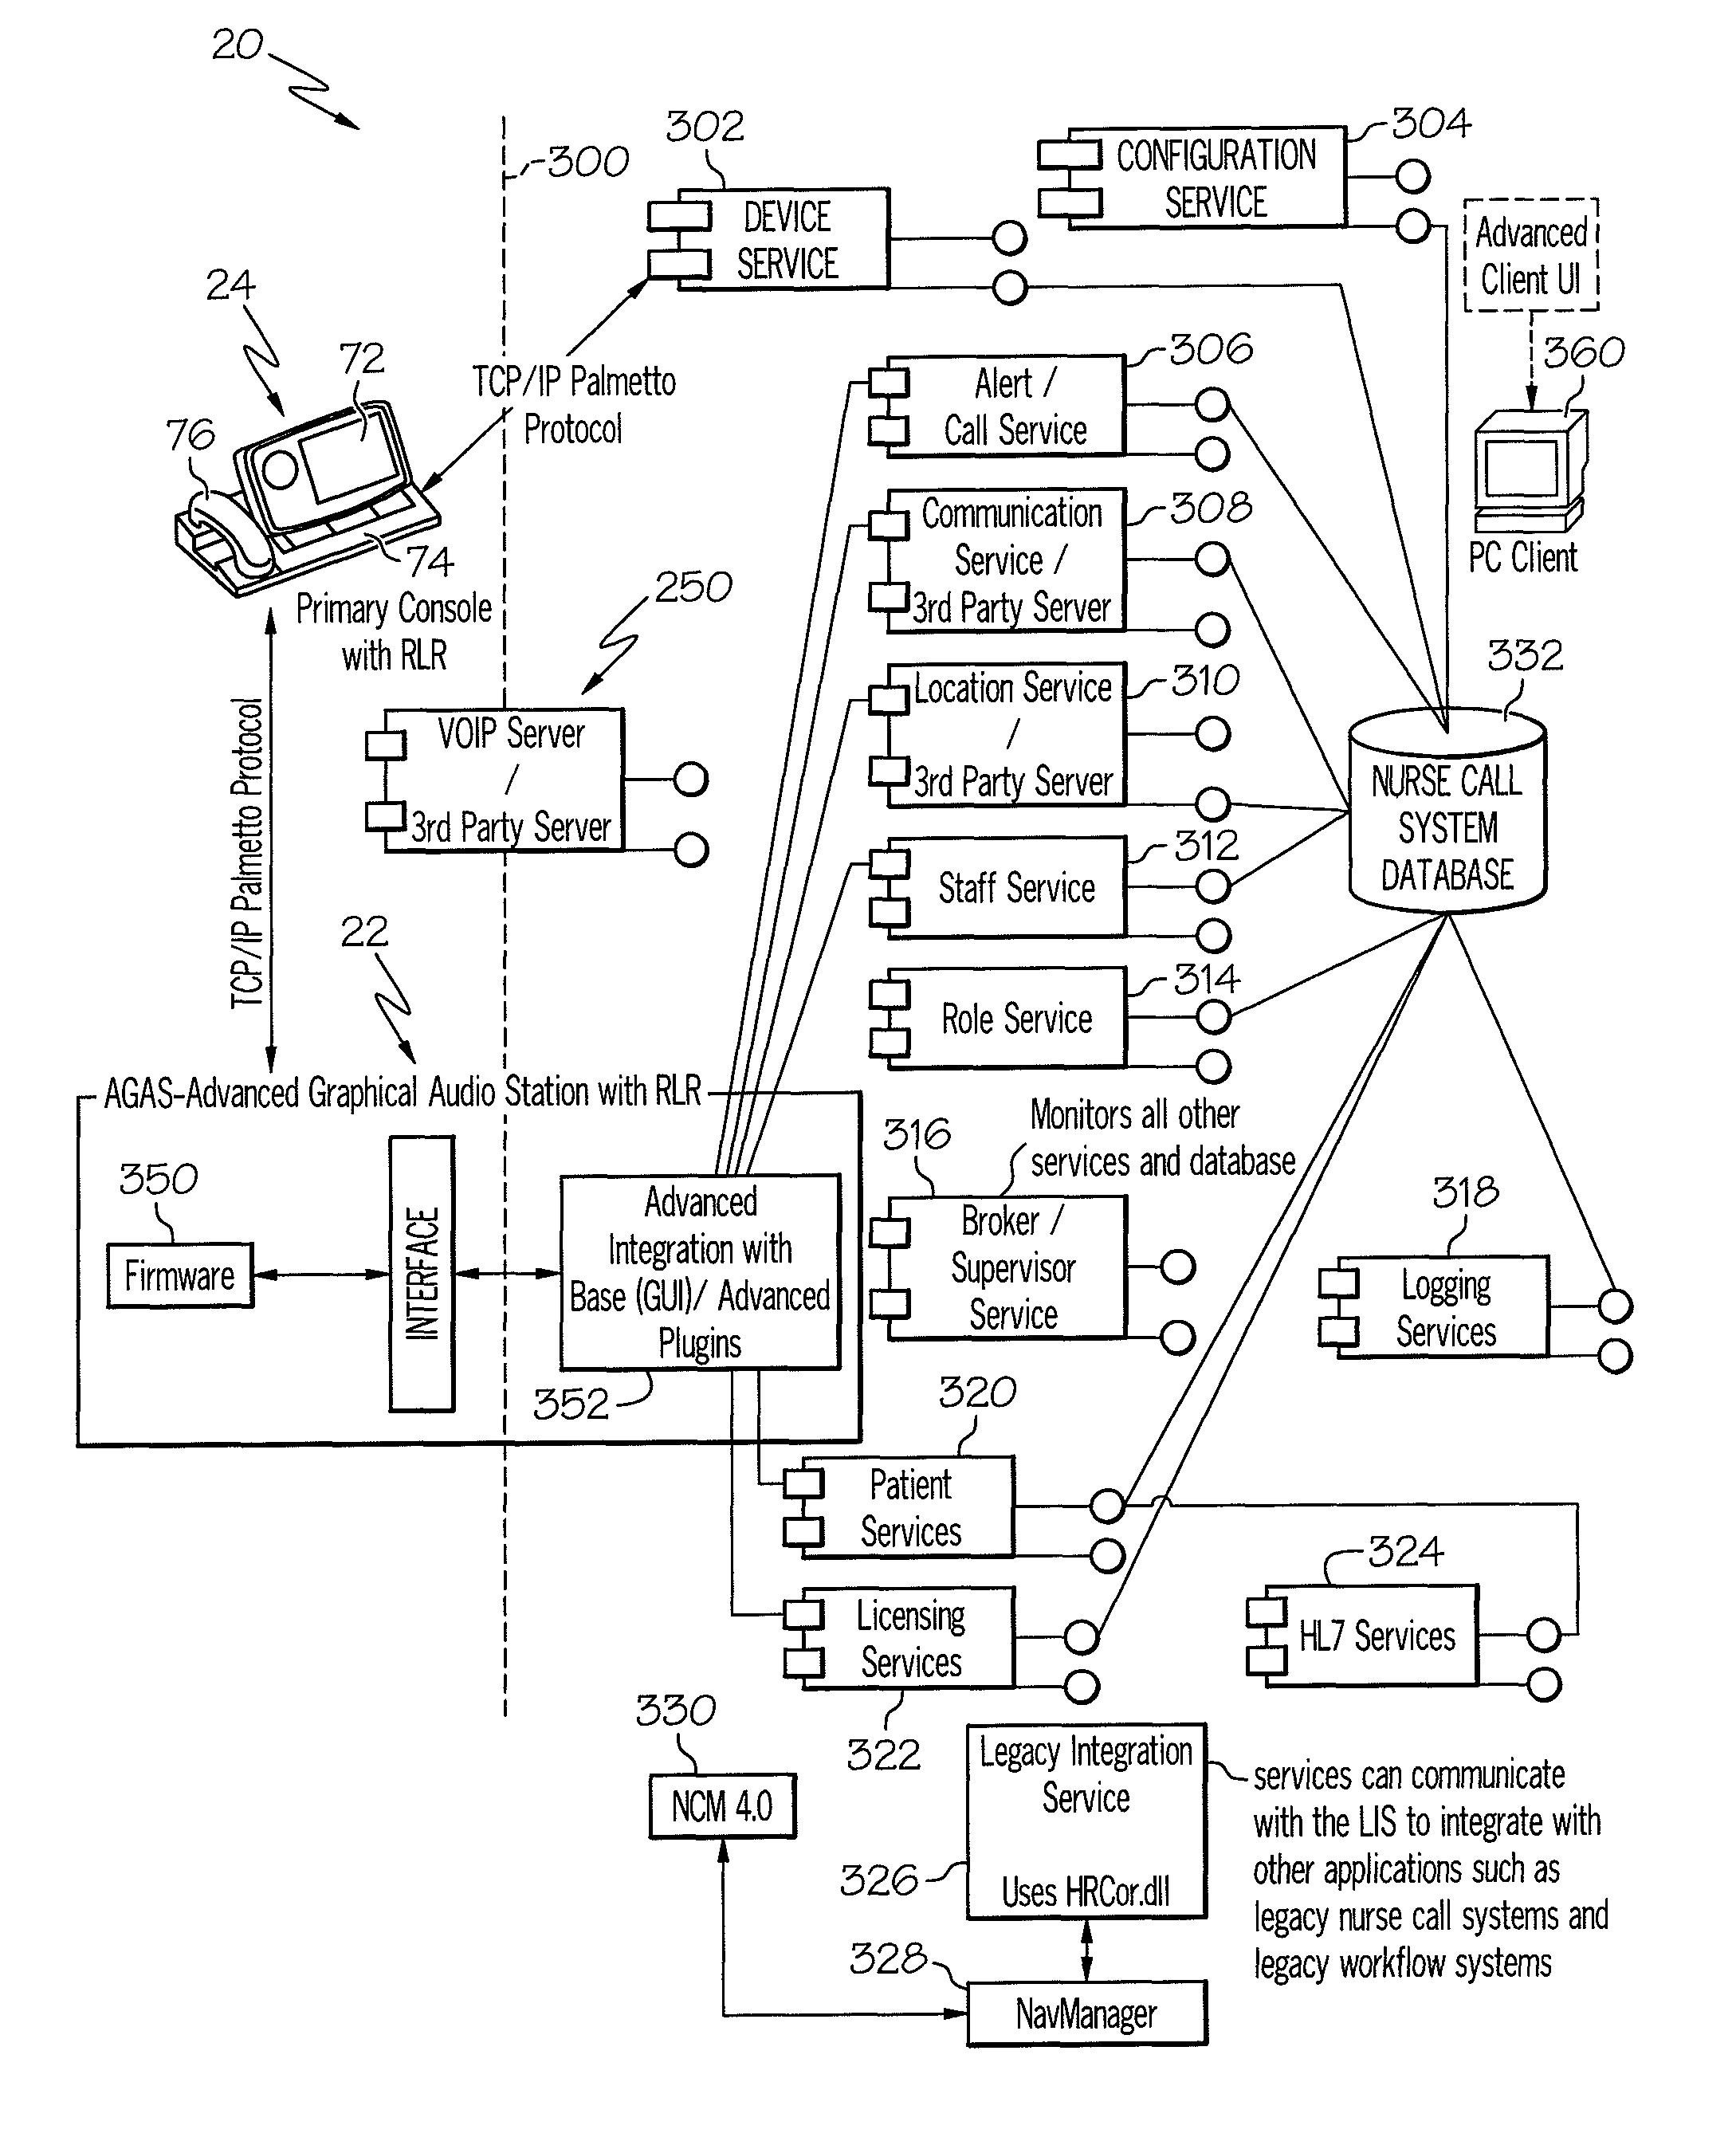 cornell nurse call wiring diagram Collection-Nurse Call System Wiring Diagram Dukane Nurse Call Wiring Diagram Agnitum Me New 17-p